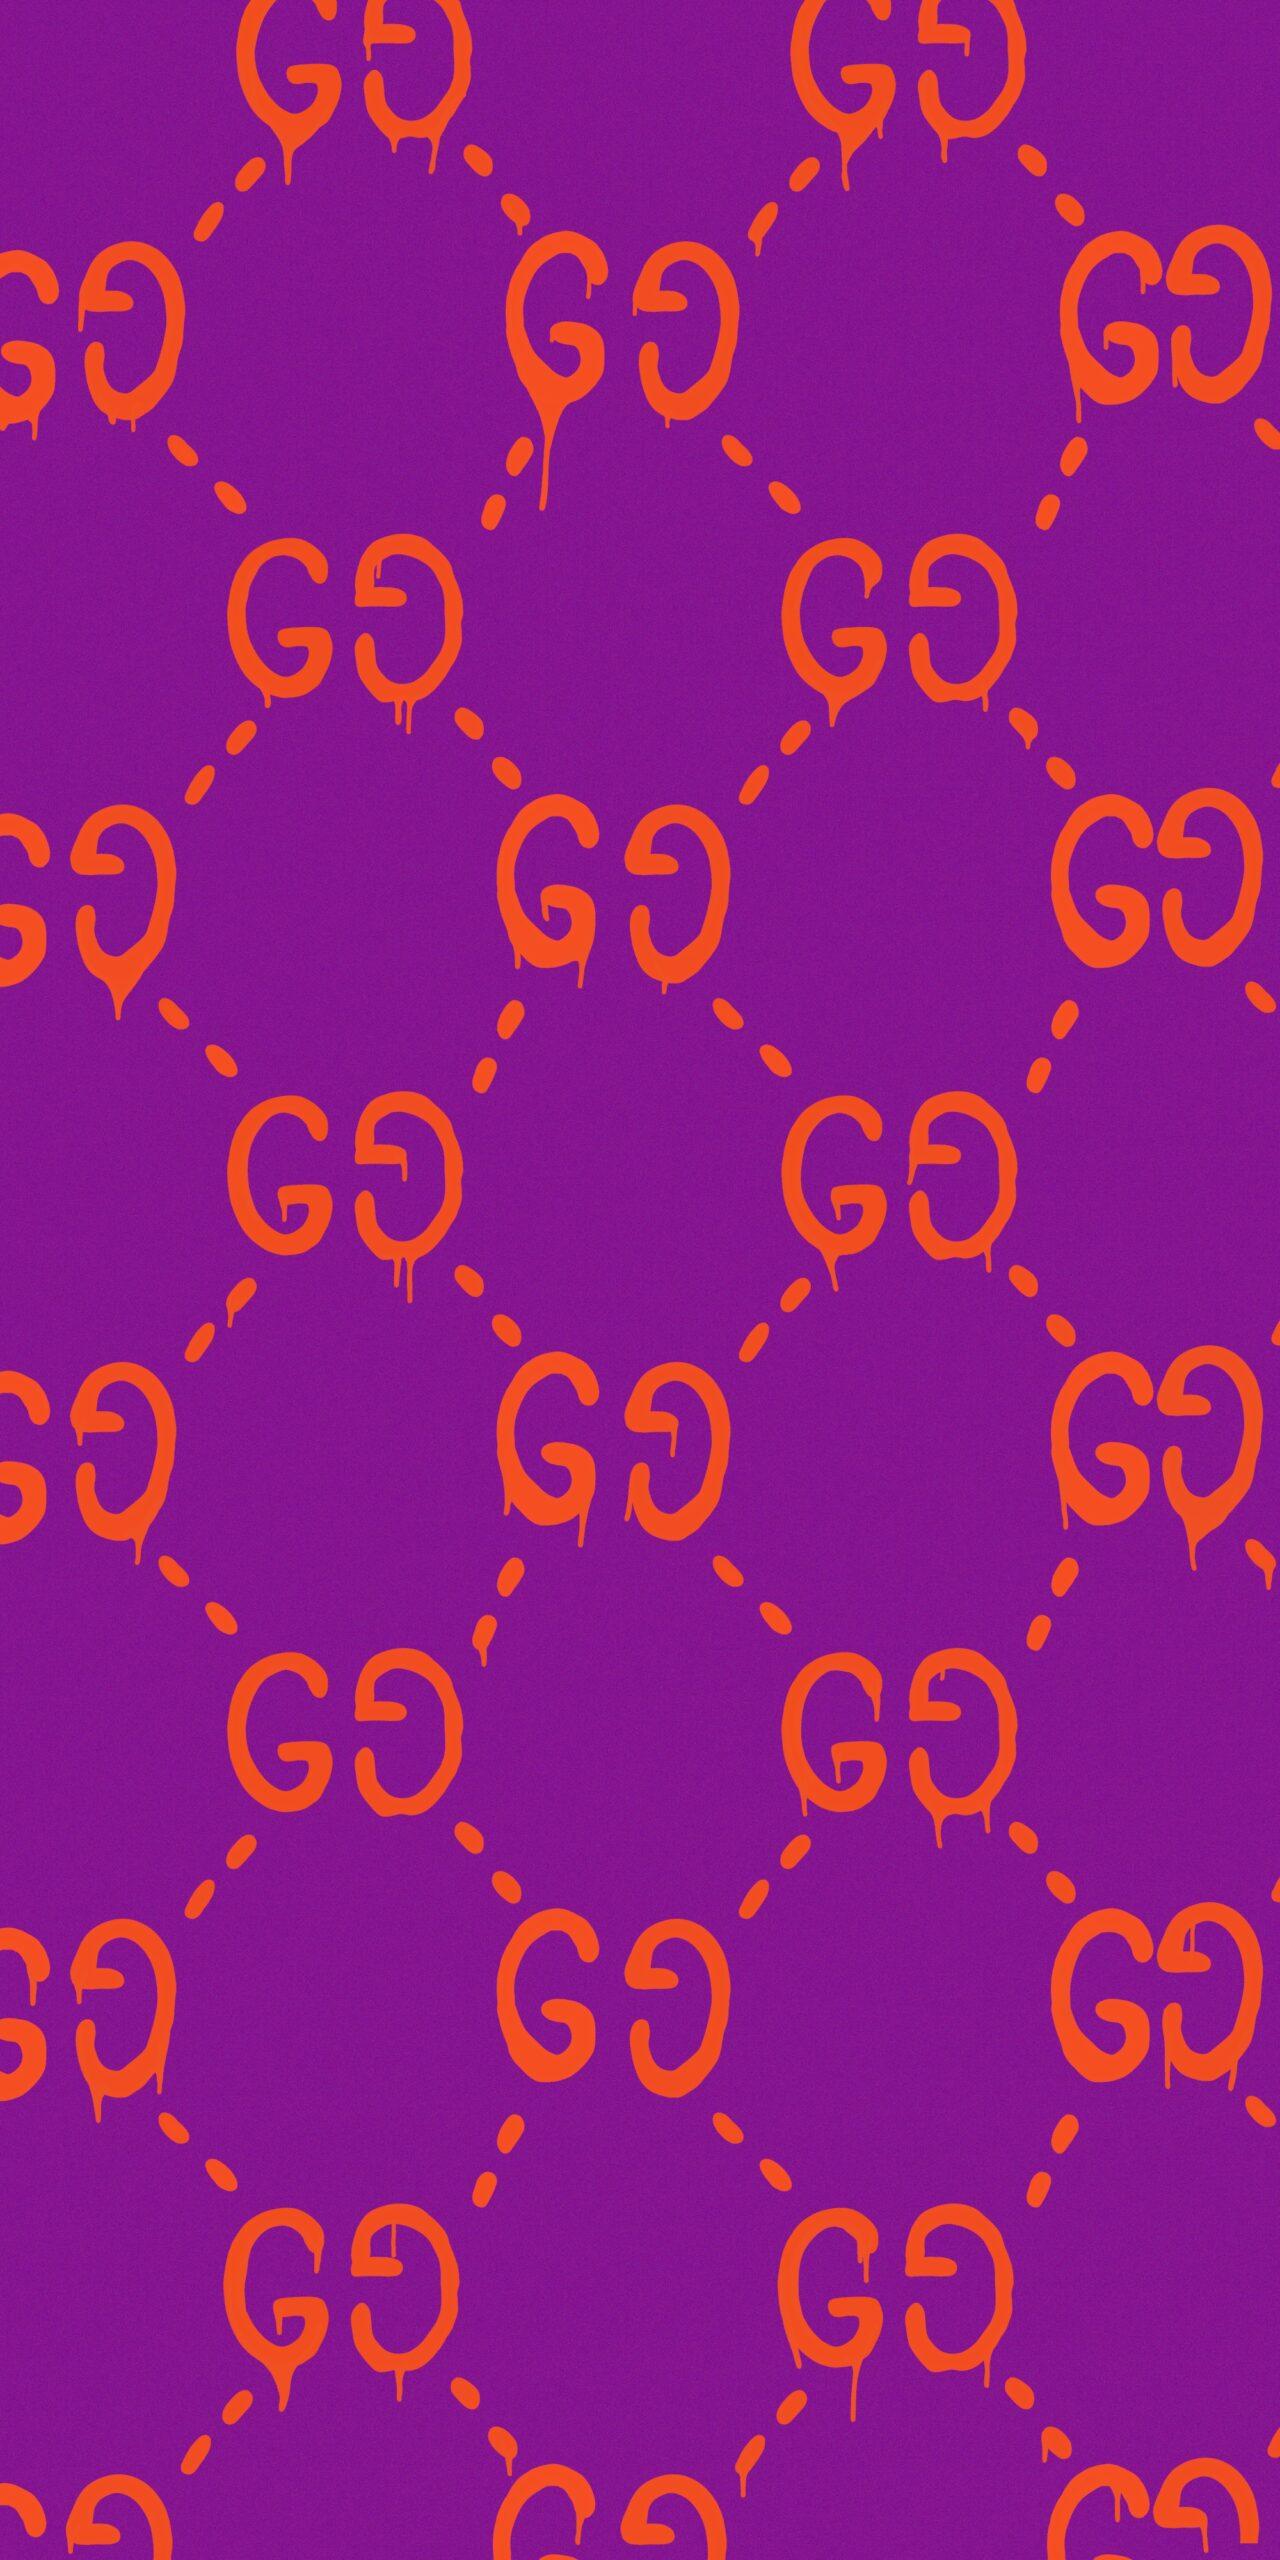 gucci ghost pattern purple wallpaper